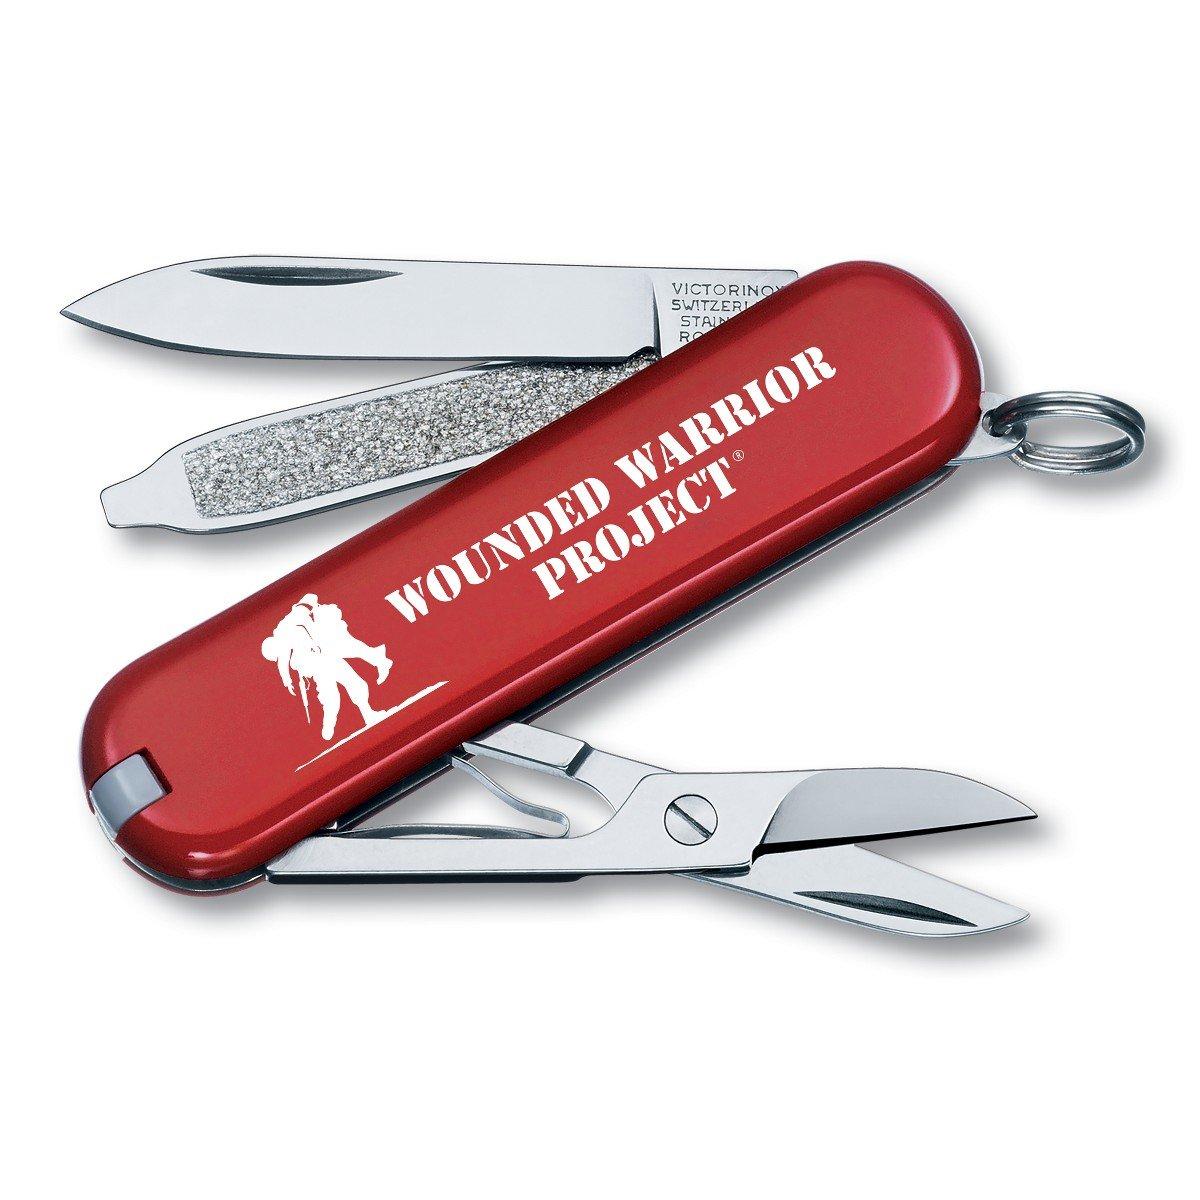 Victorinox Swiss Army Classic SD Pocket Knife, Red with WWP Logo